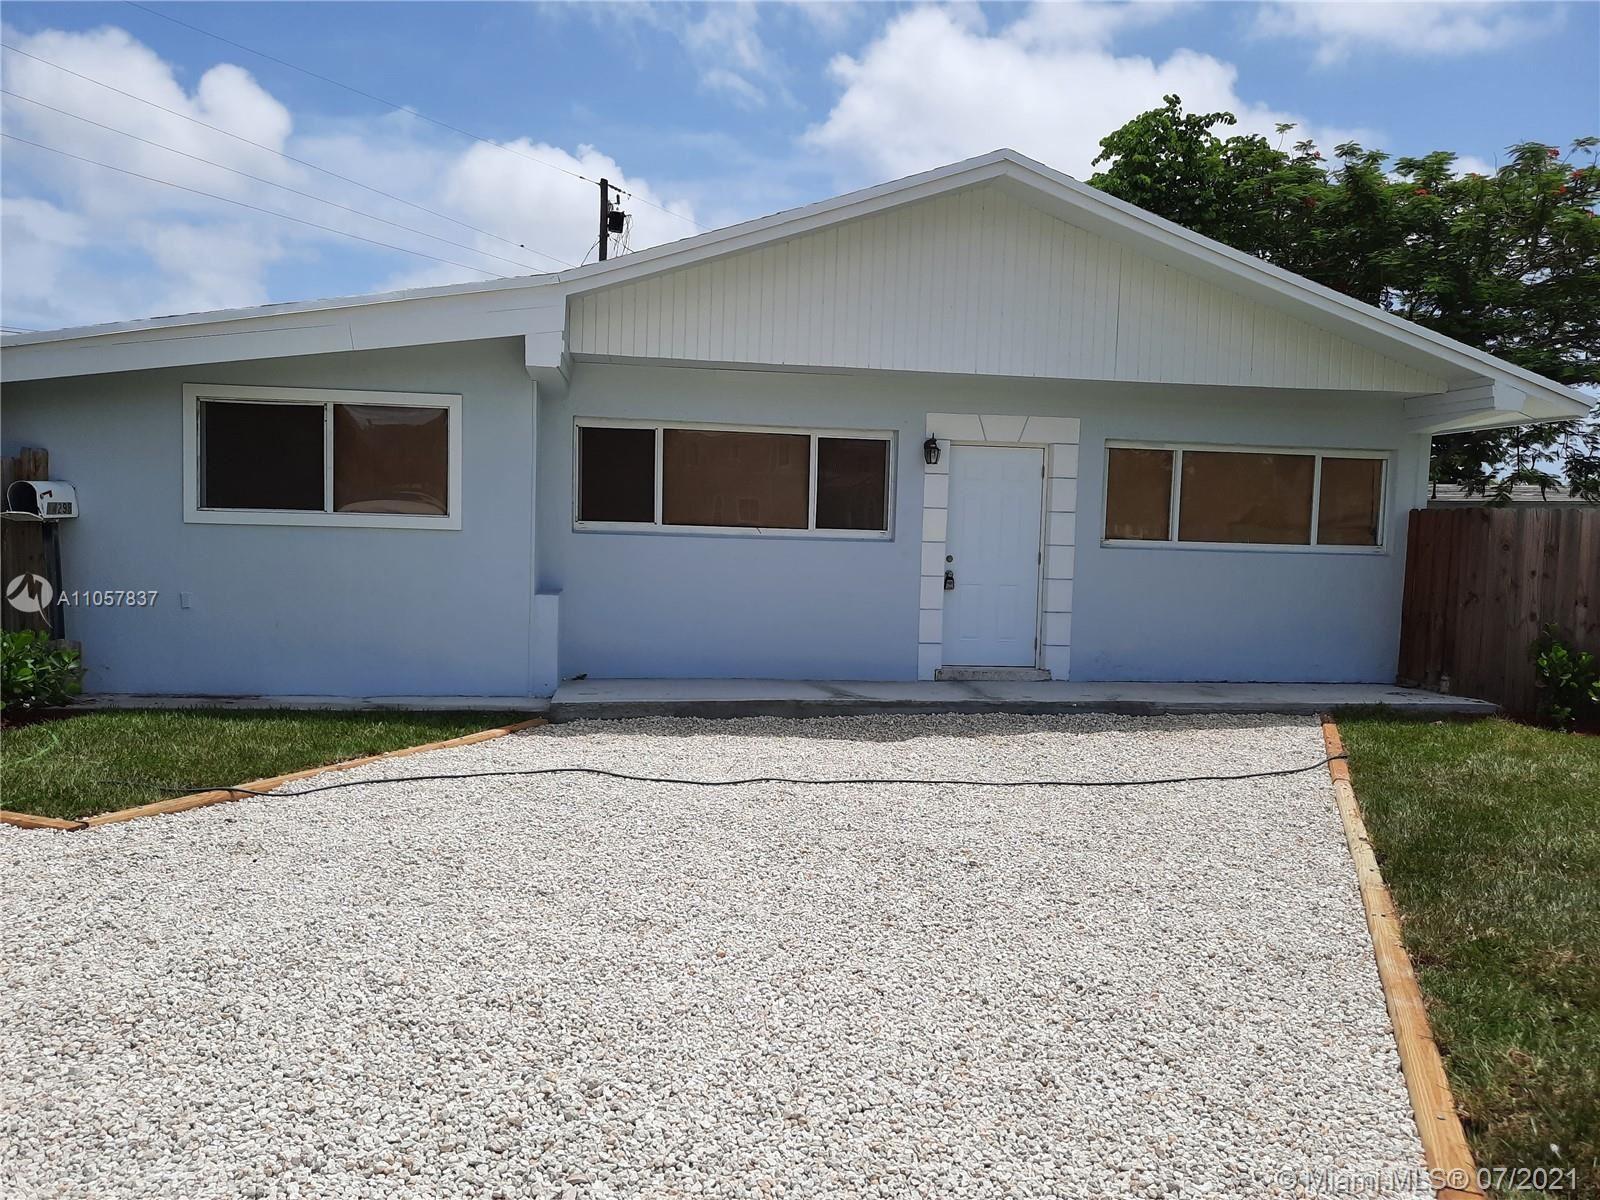 14295 SW 272nd St, Homestead, FL 33032 - #: A11057837